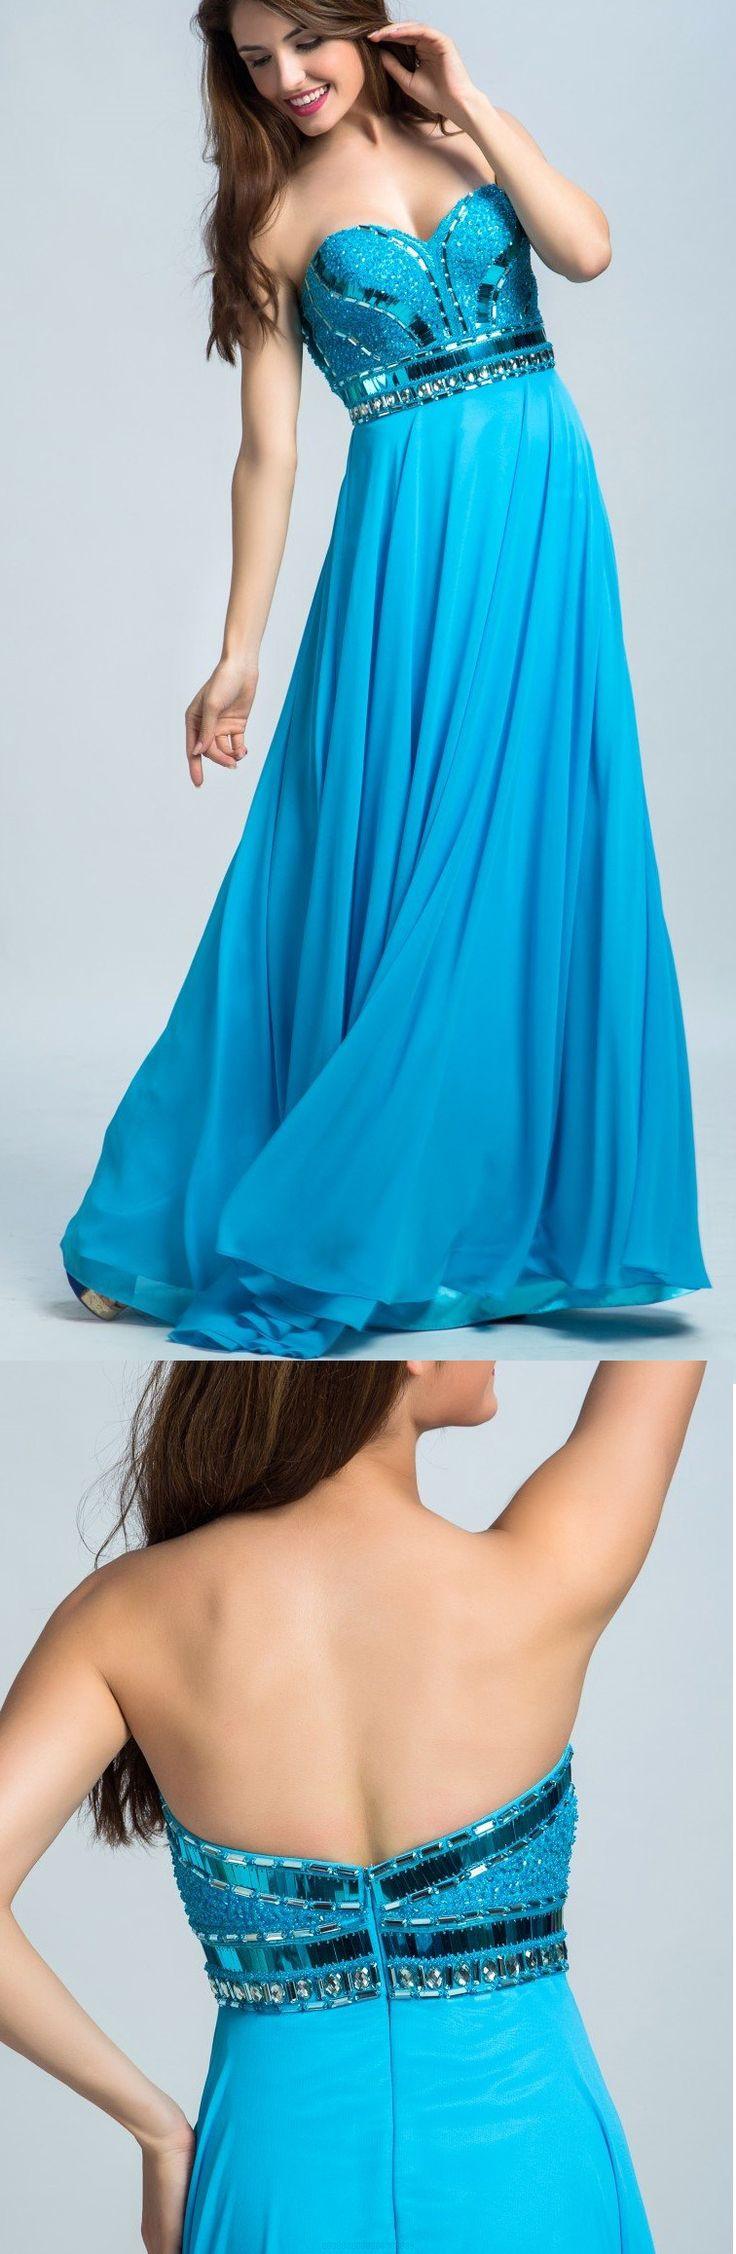 679 best Prom Dresses images on Pinterest